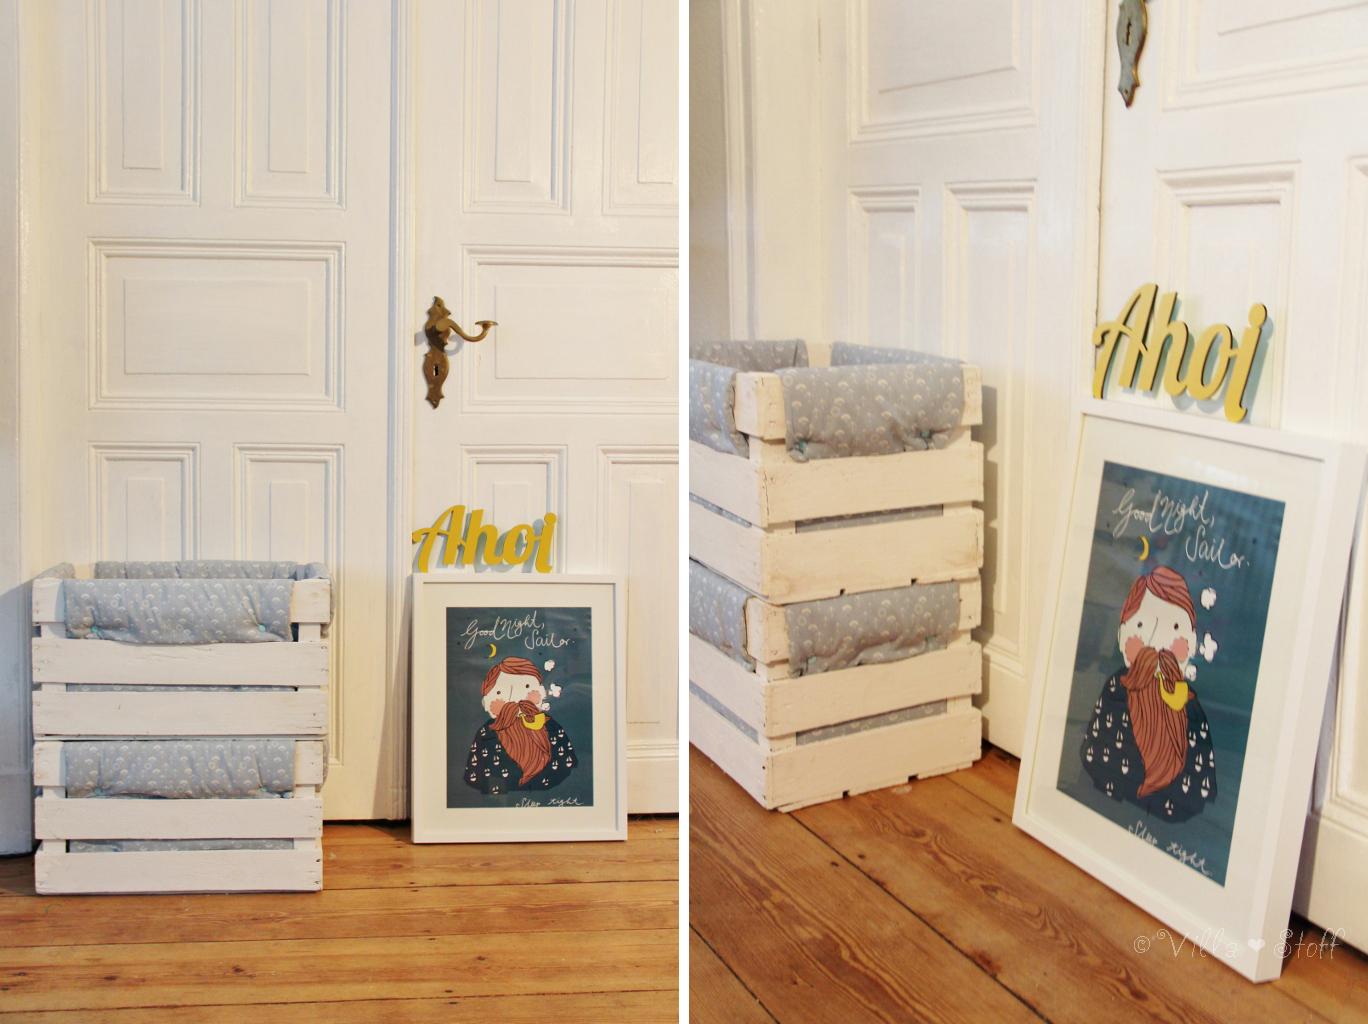 villa stoff blog ordnung ist das halbe leben upcycling. Black Bedroom Furniture Sets. Home Design Ideas